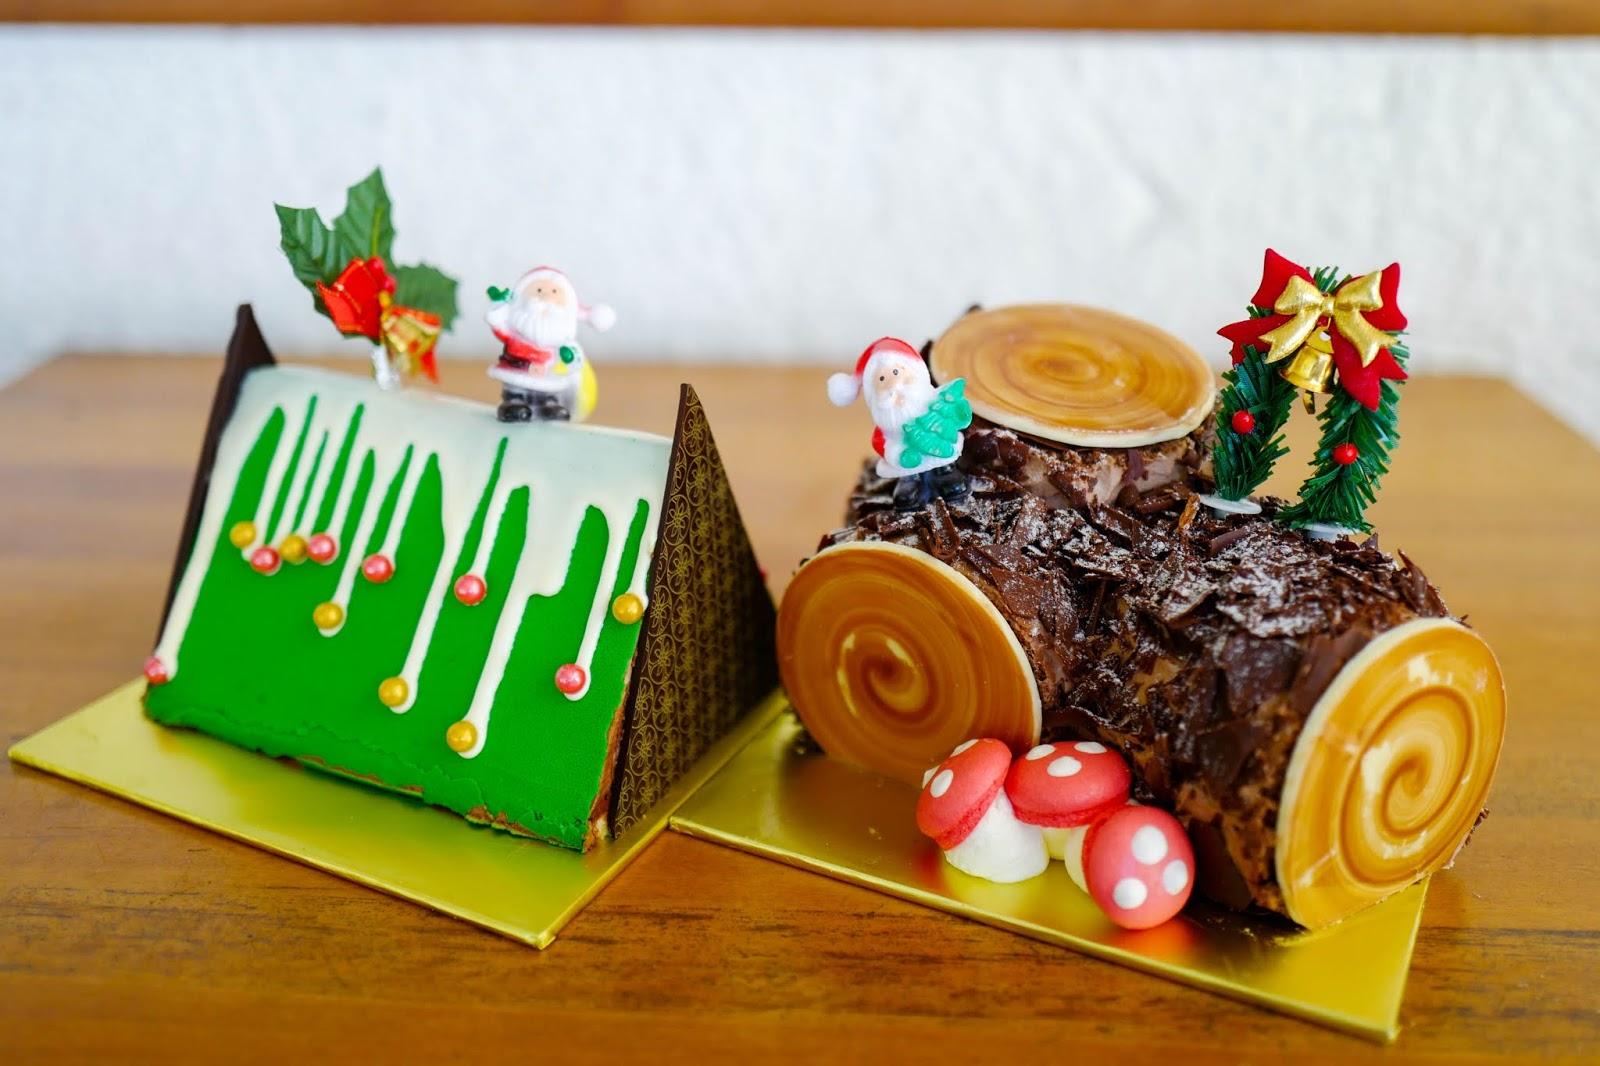 levain boulangerie & patisserie: christmas dinners & cakes